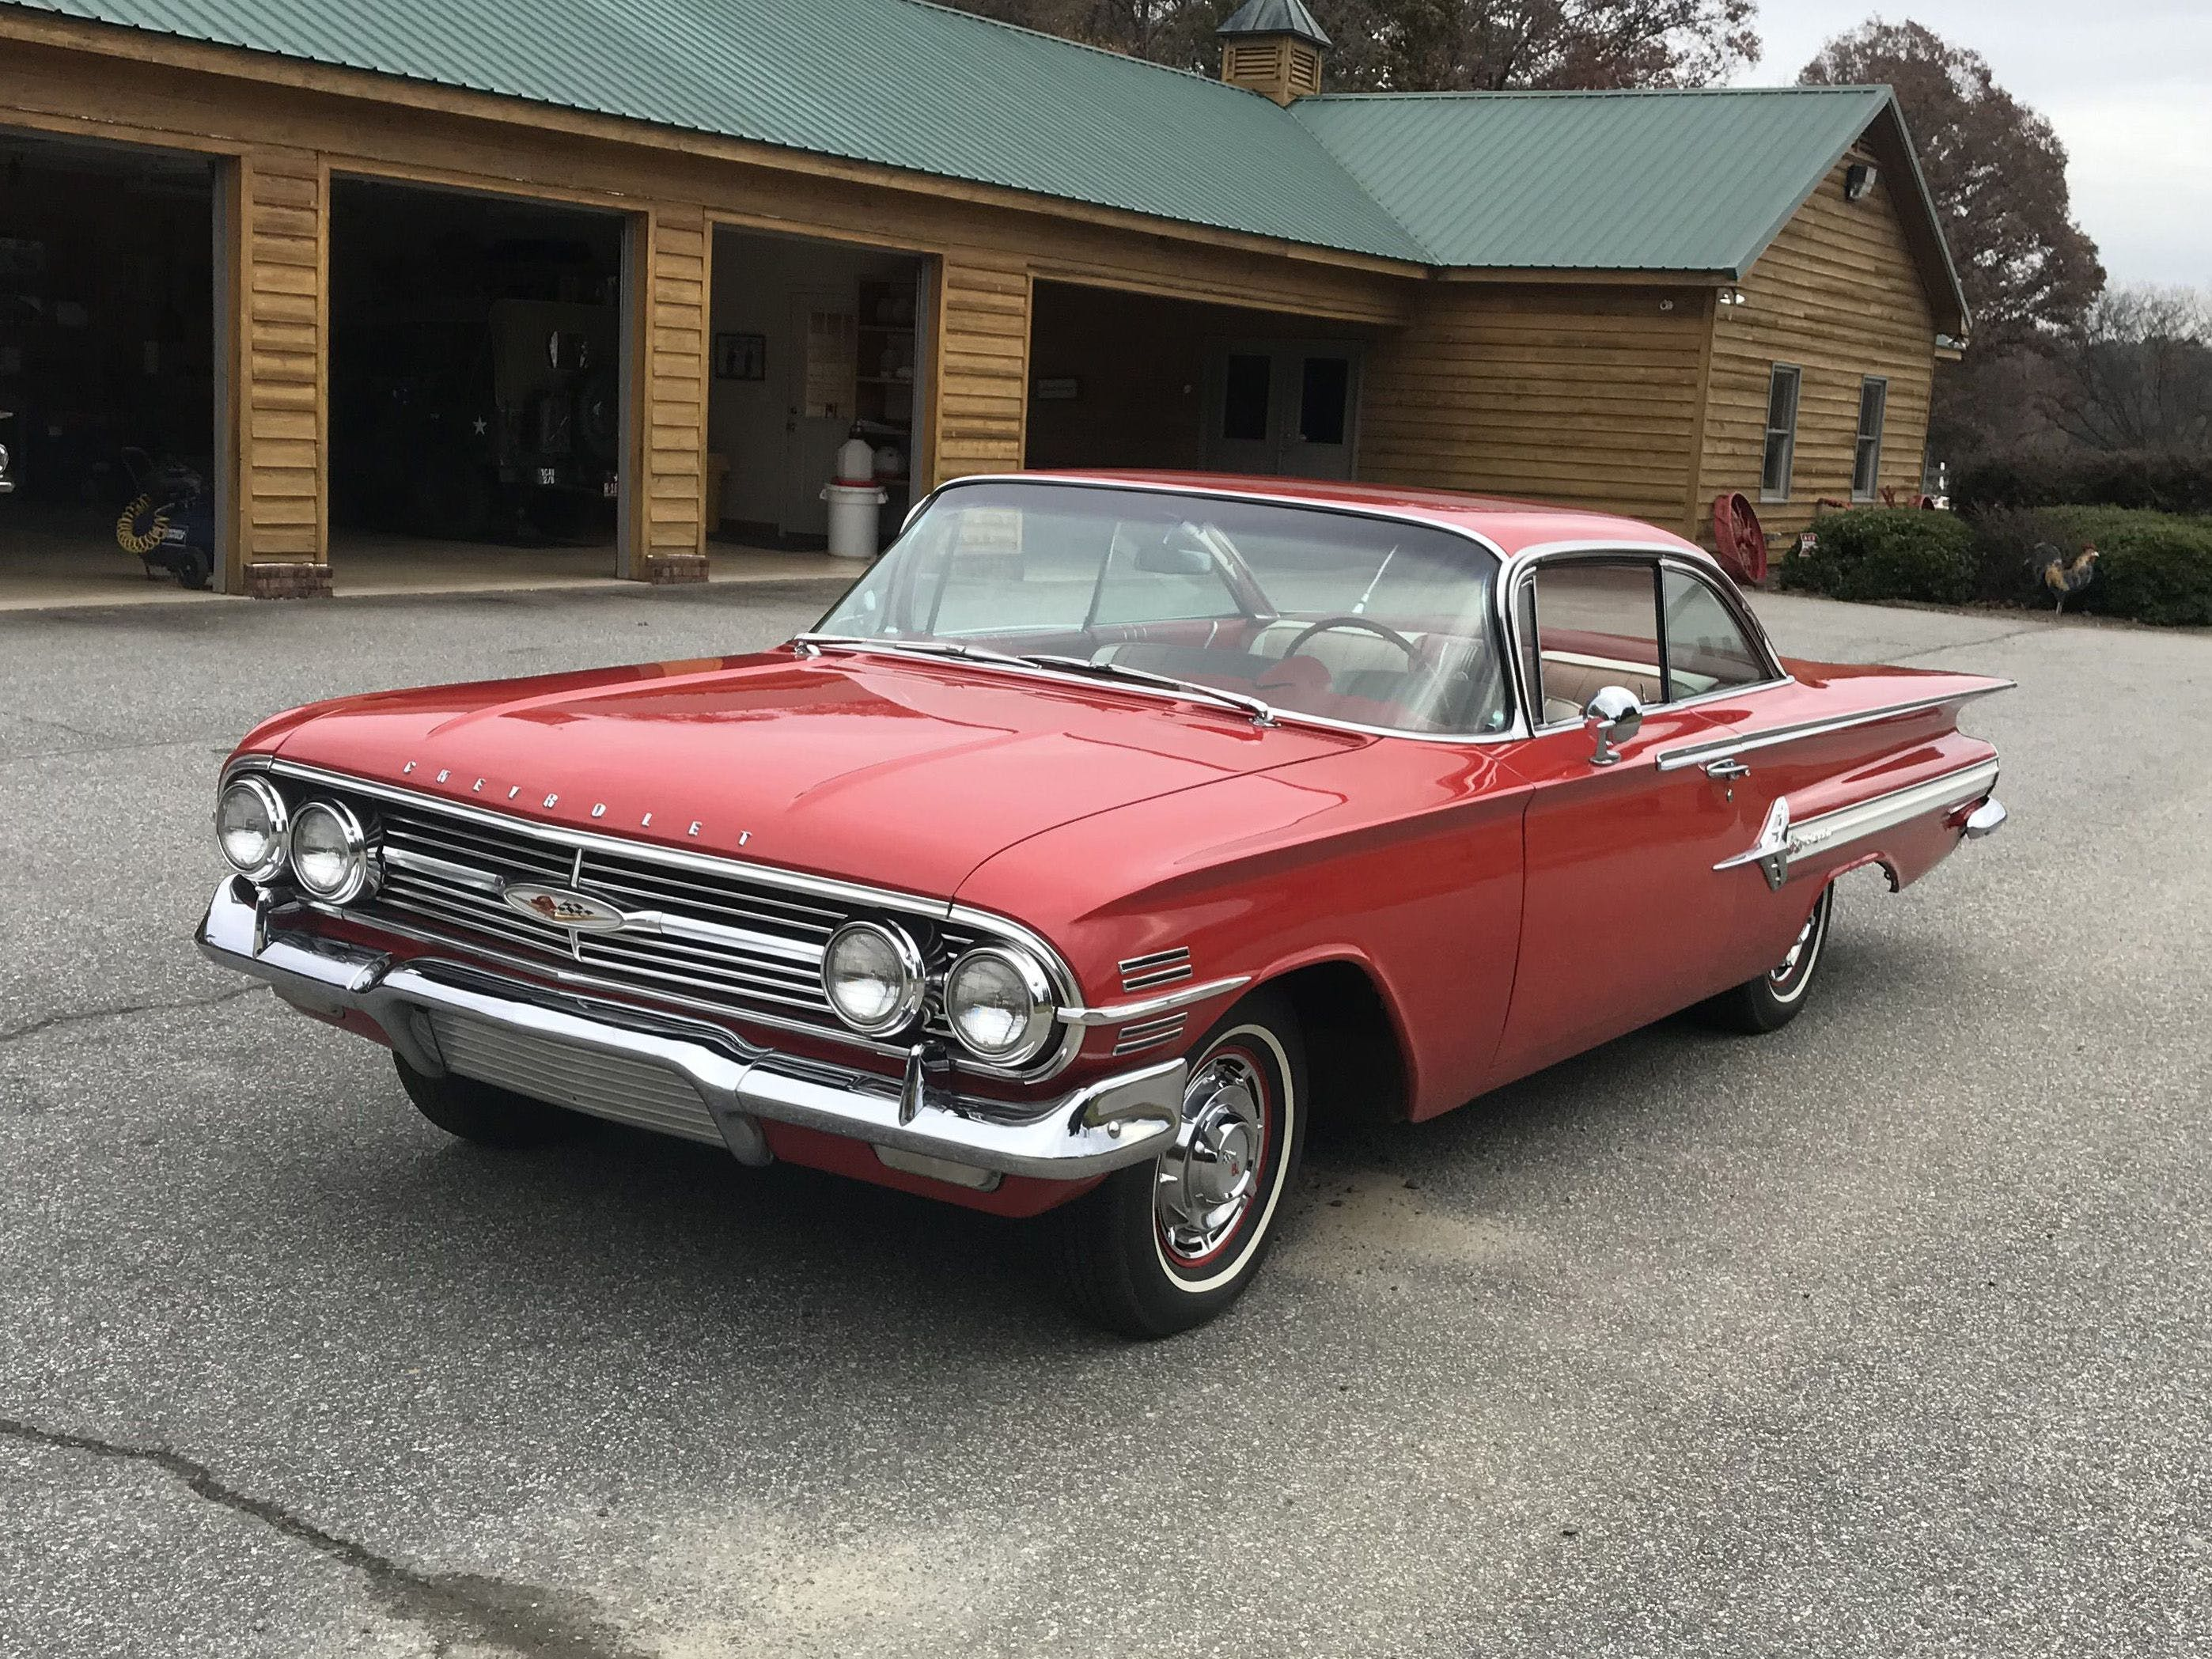 Kekurangan Chevrolet Impala 1960 Harga